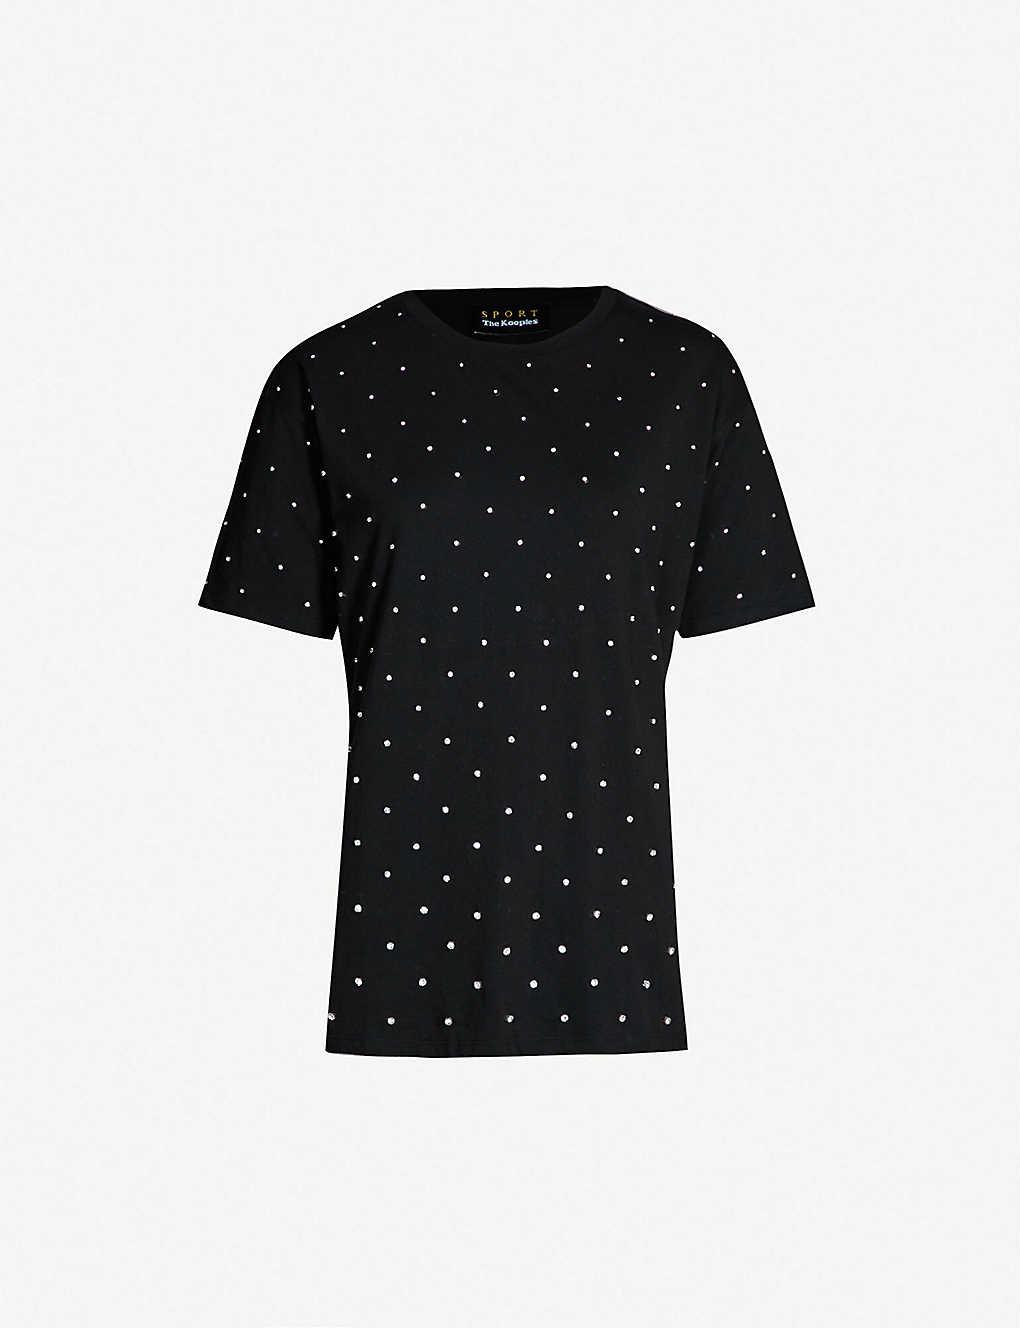 0456eb6ee THE KOOPLES - Rhinestone-embellished cotton-jersey T-shirt ...